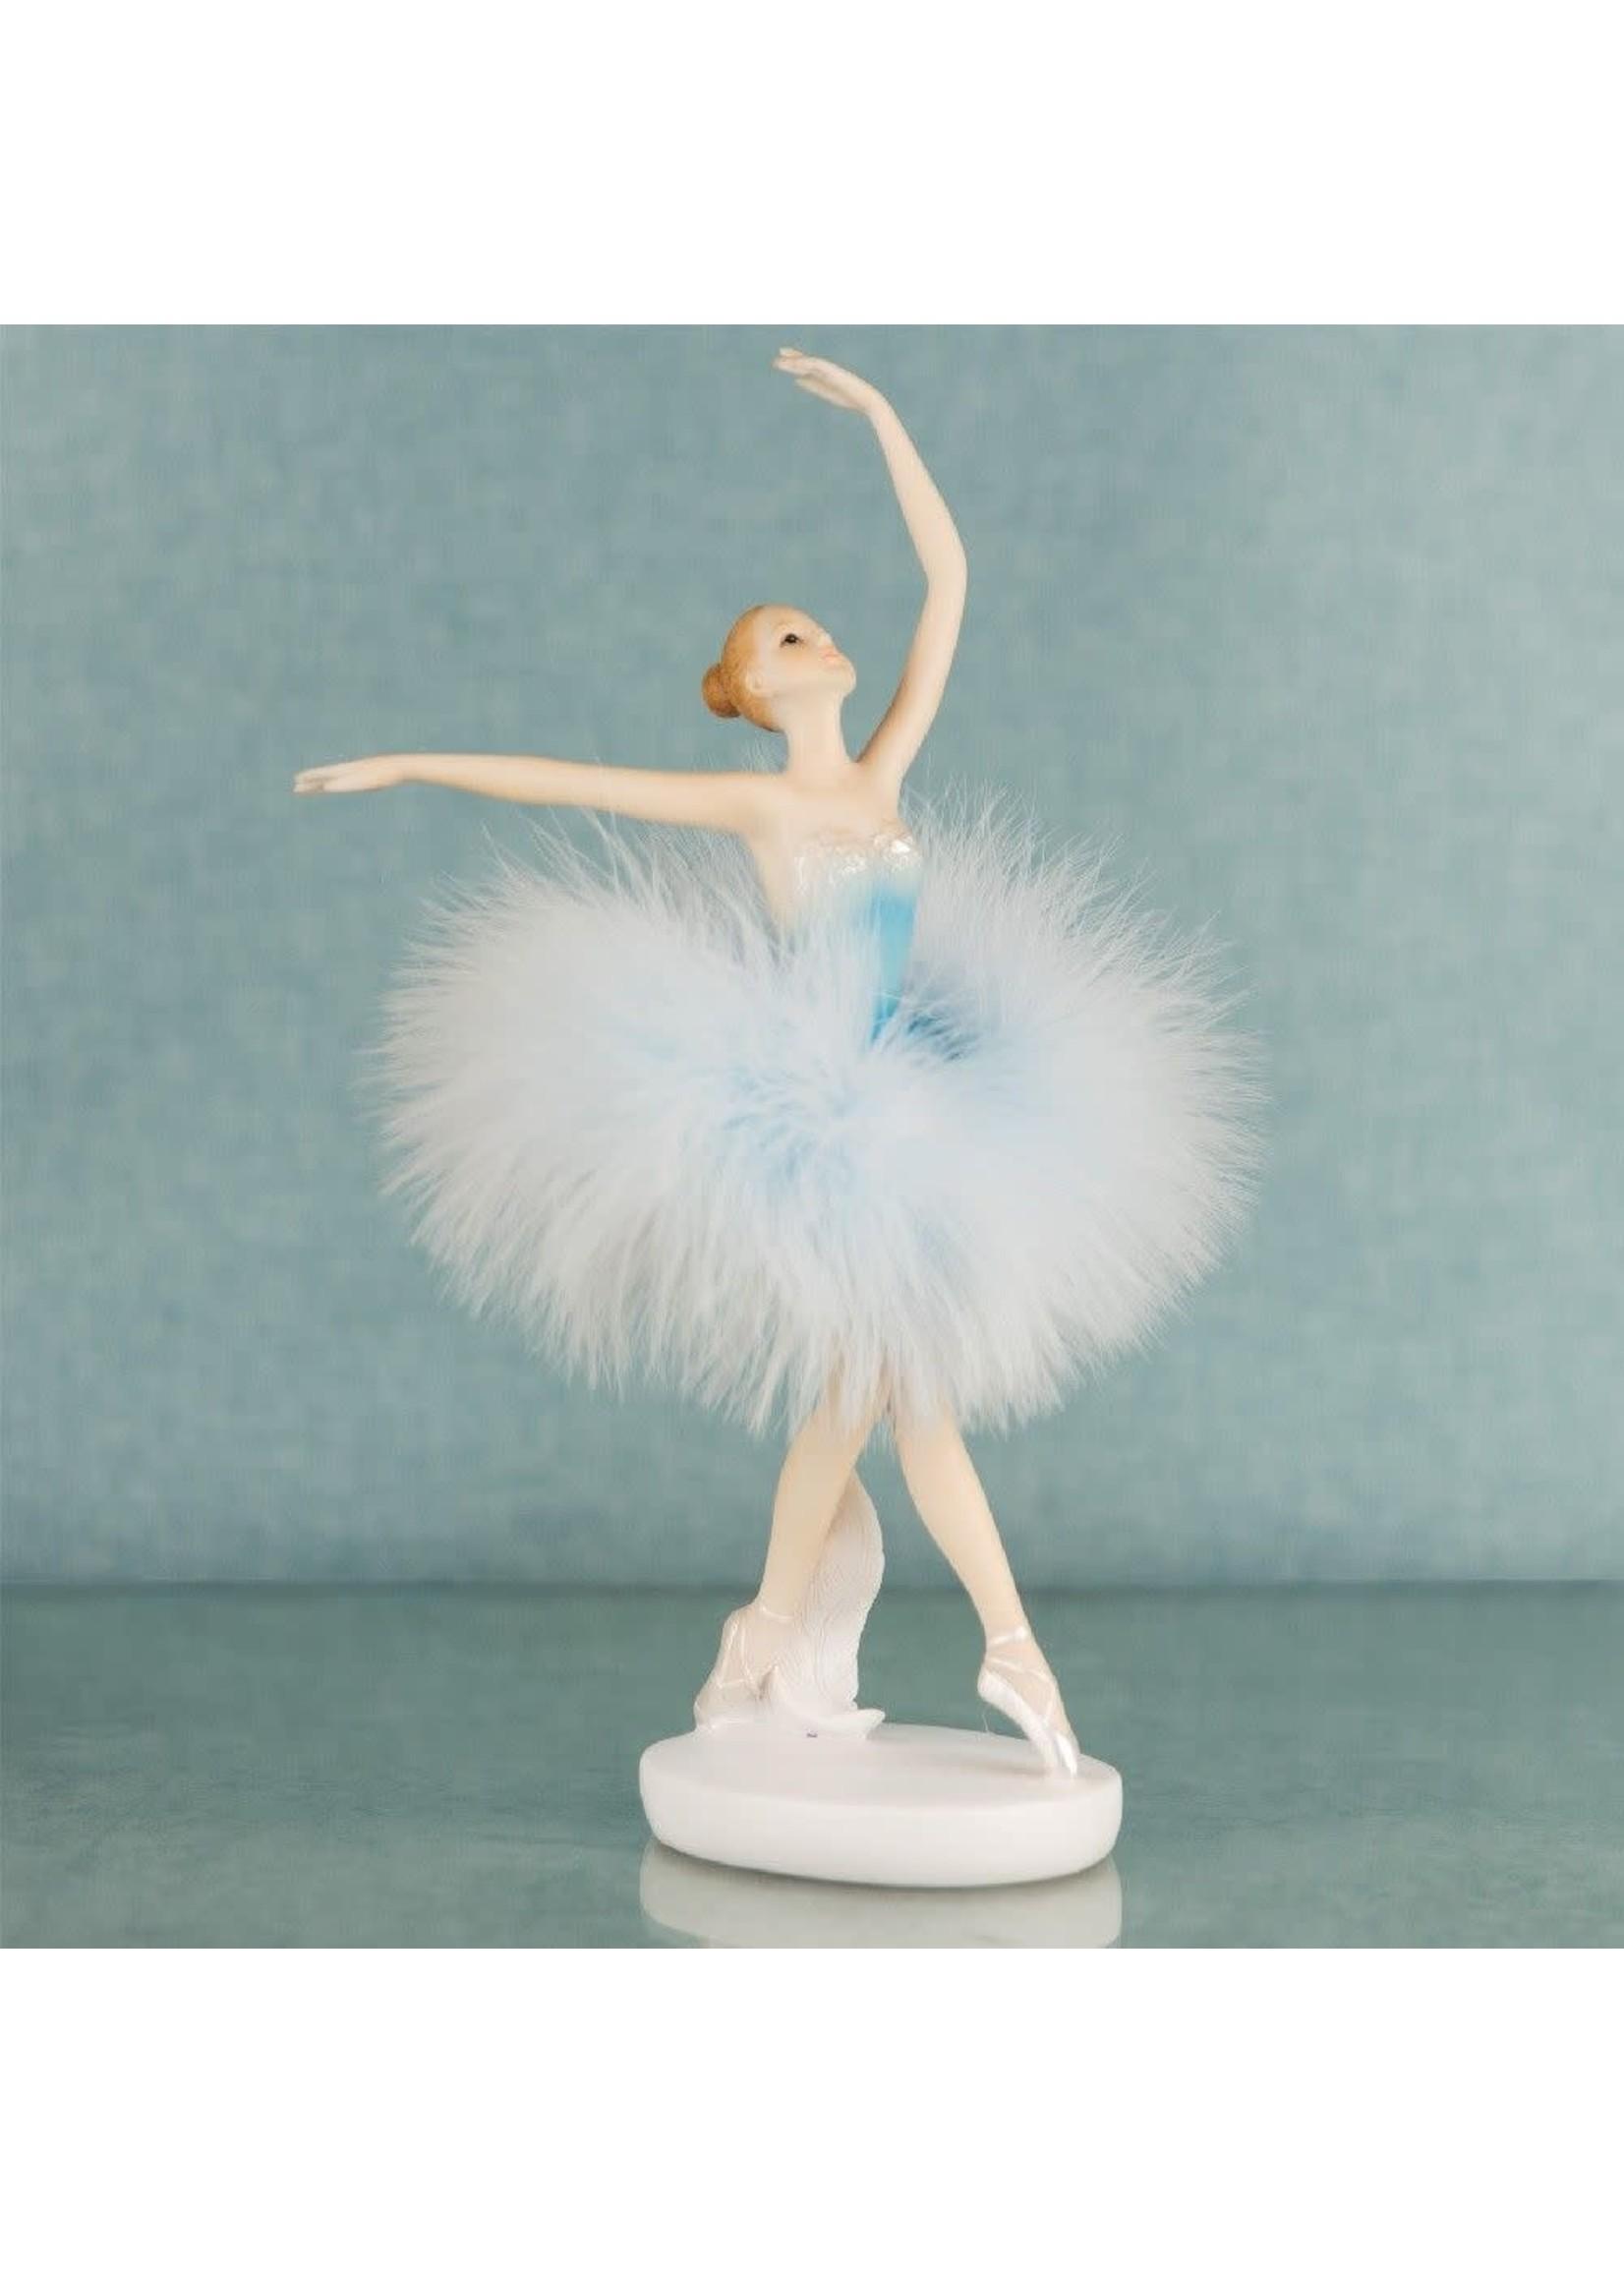 BALLERINA DANCER RESIN FIGURINE IN BLUE DRESS 23.5CM